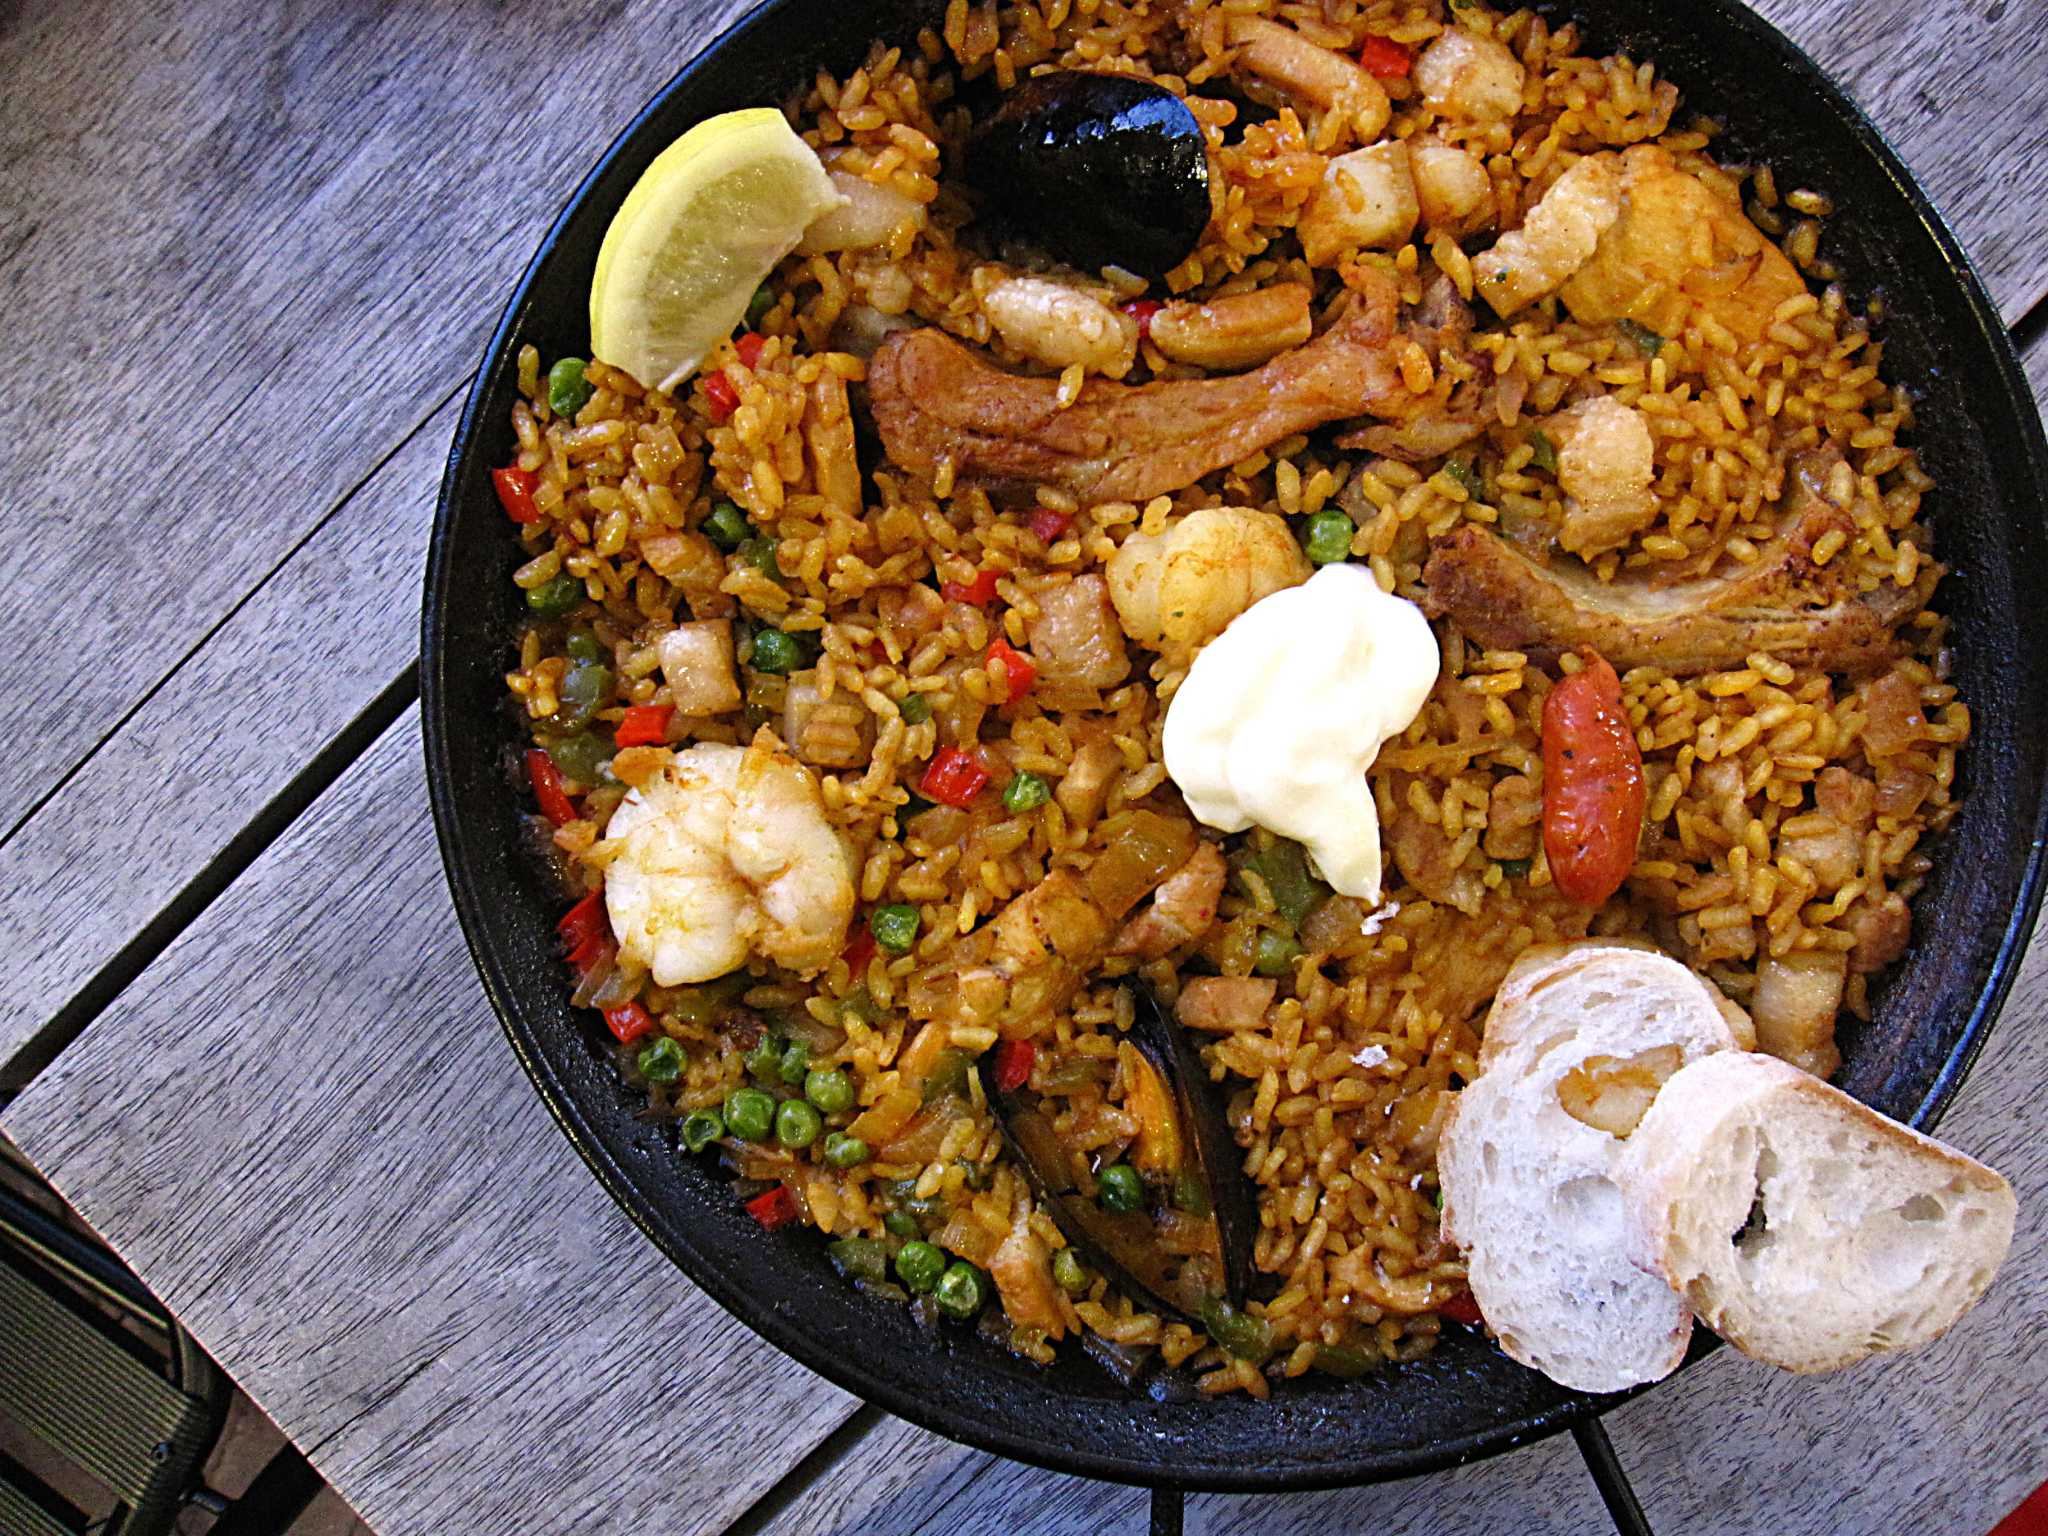 Stone Oak Spanish restaurant Toro to launch second location in St